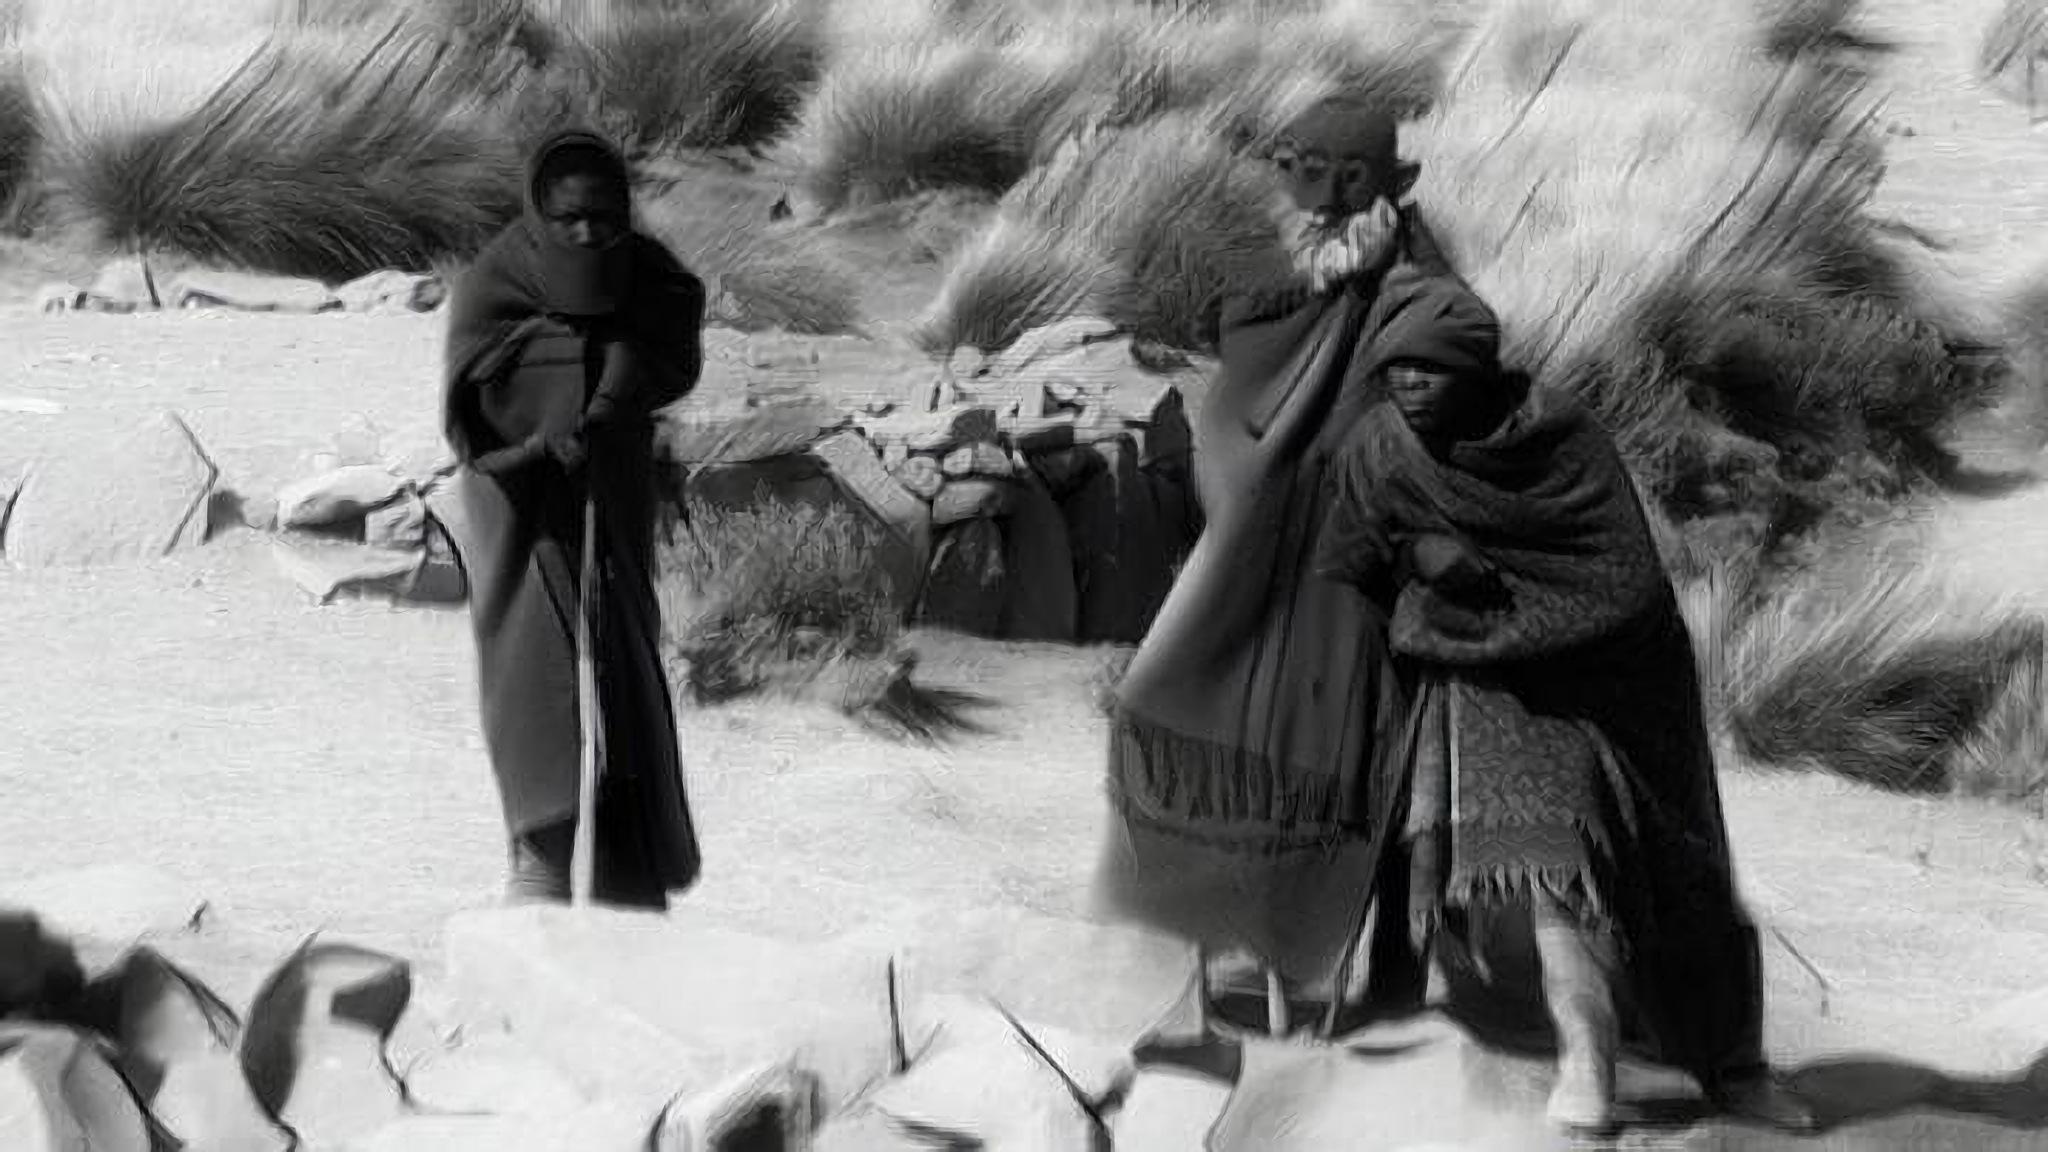 African shepherds by Florian B